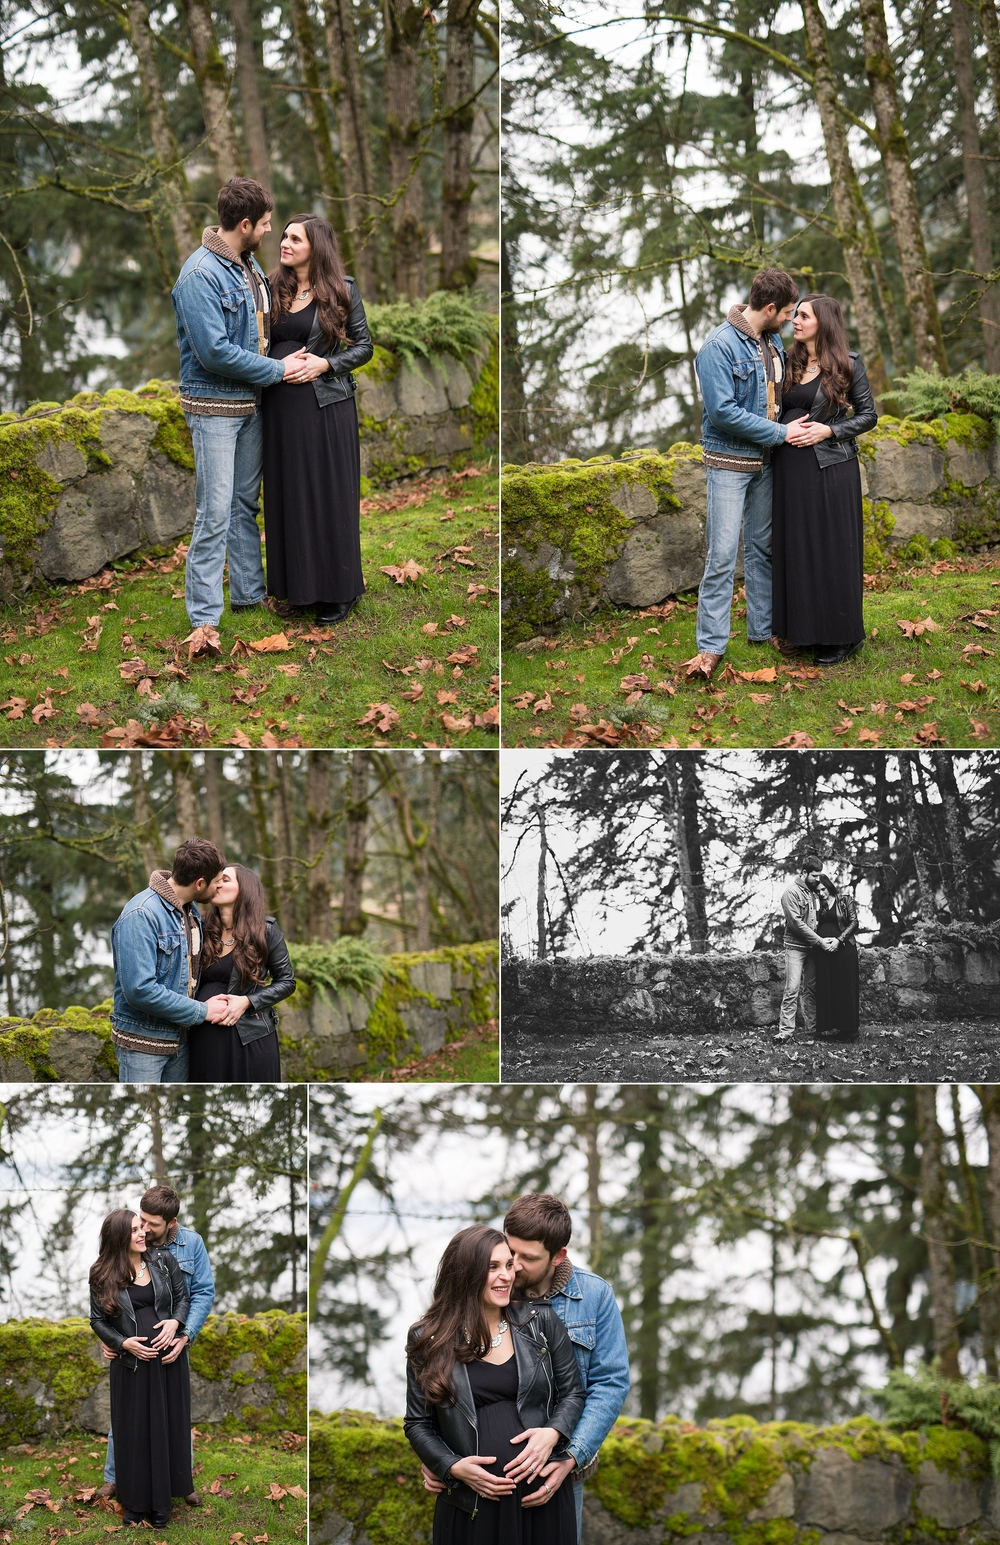 ashley vos photography seattle area lifestyle family maternity photographer_0286.jpg